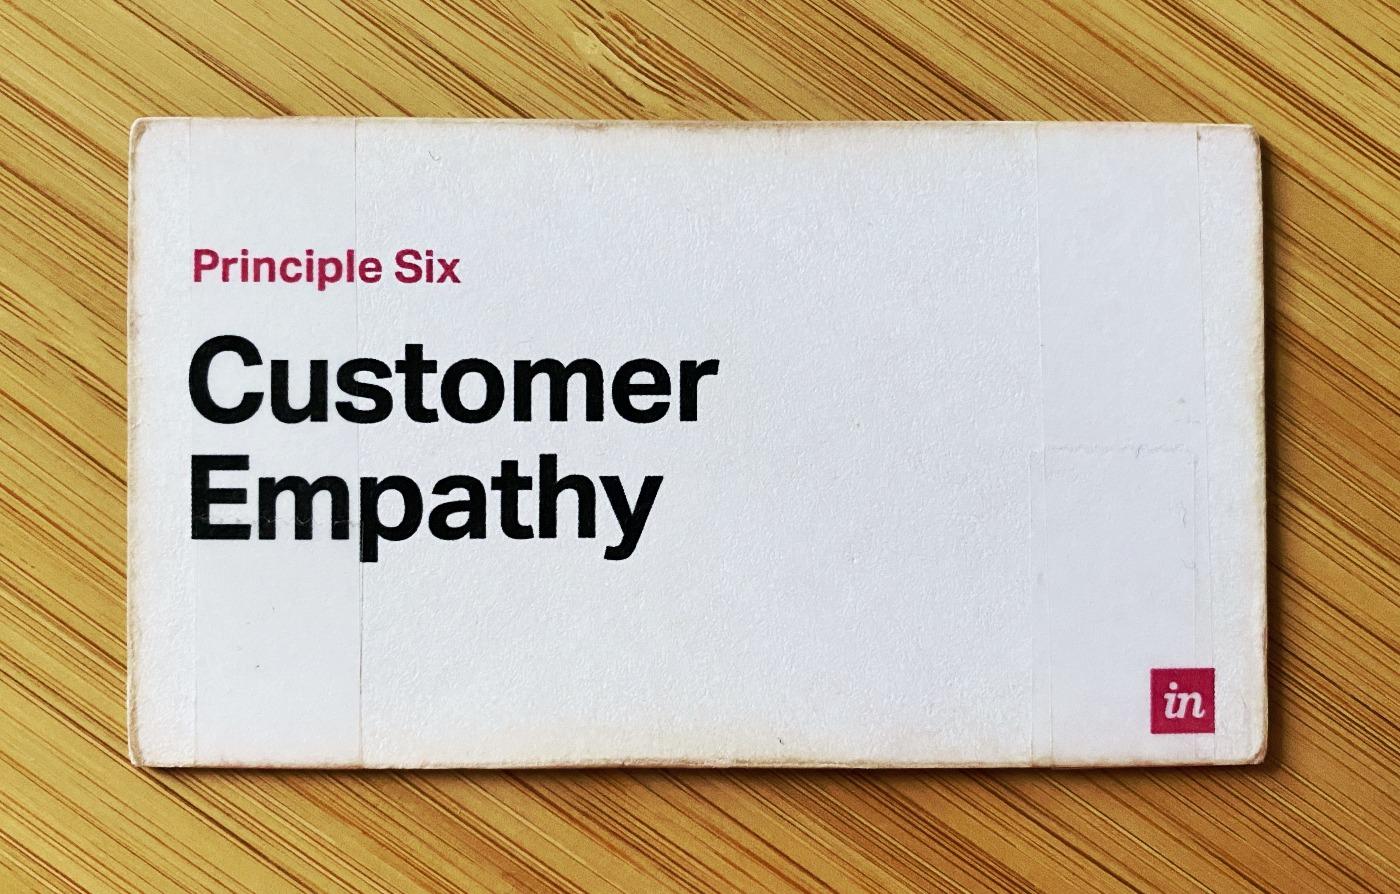 InVision Principle Six: Customer Empathy